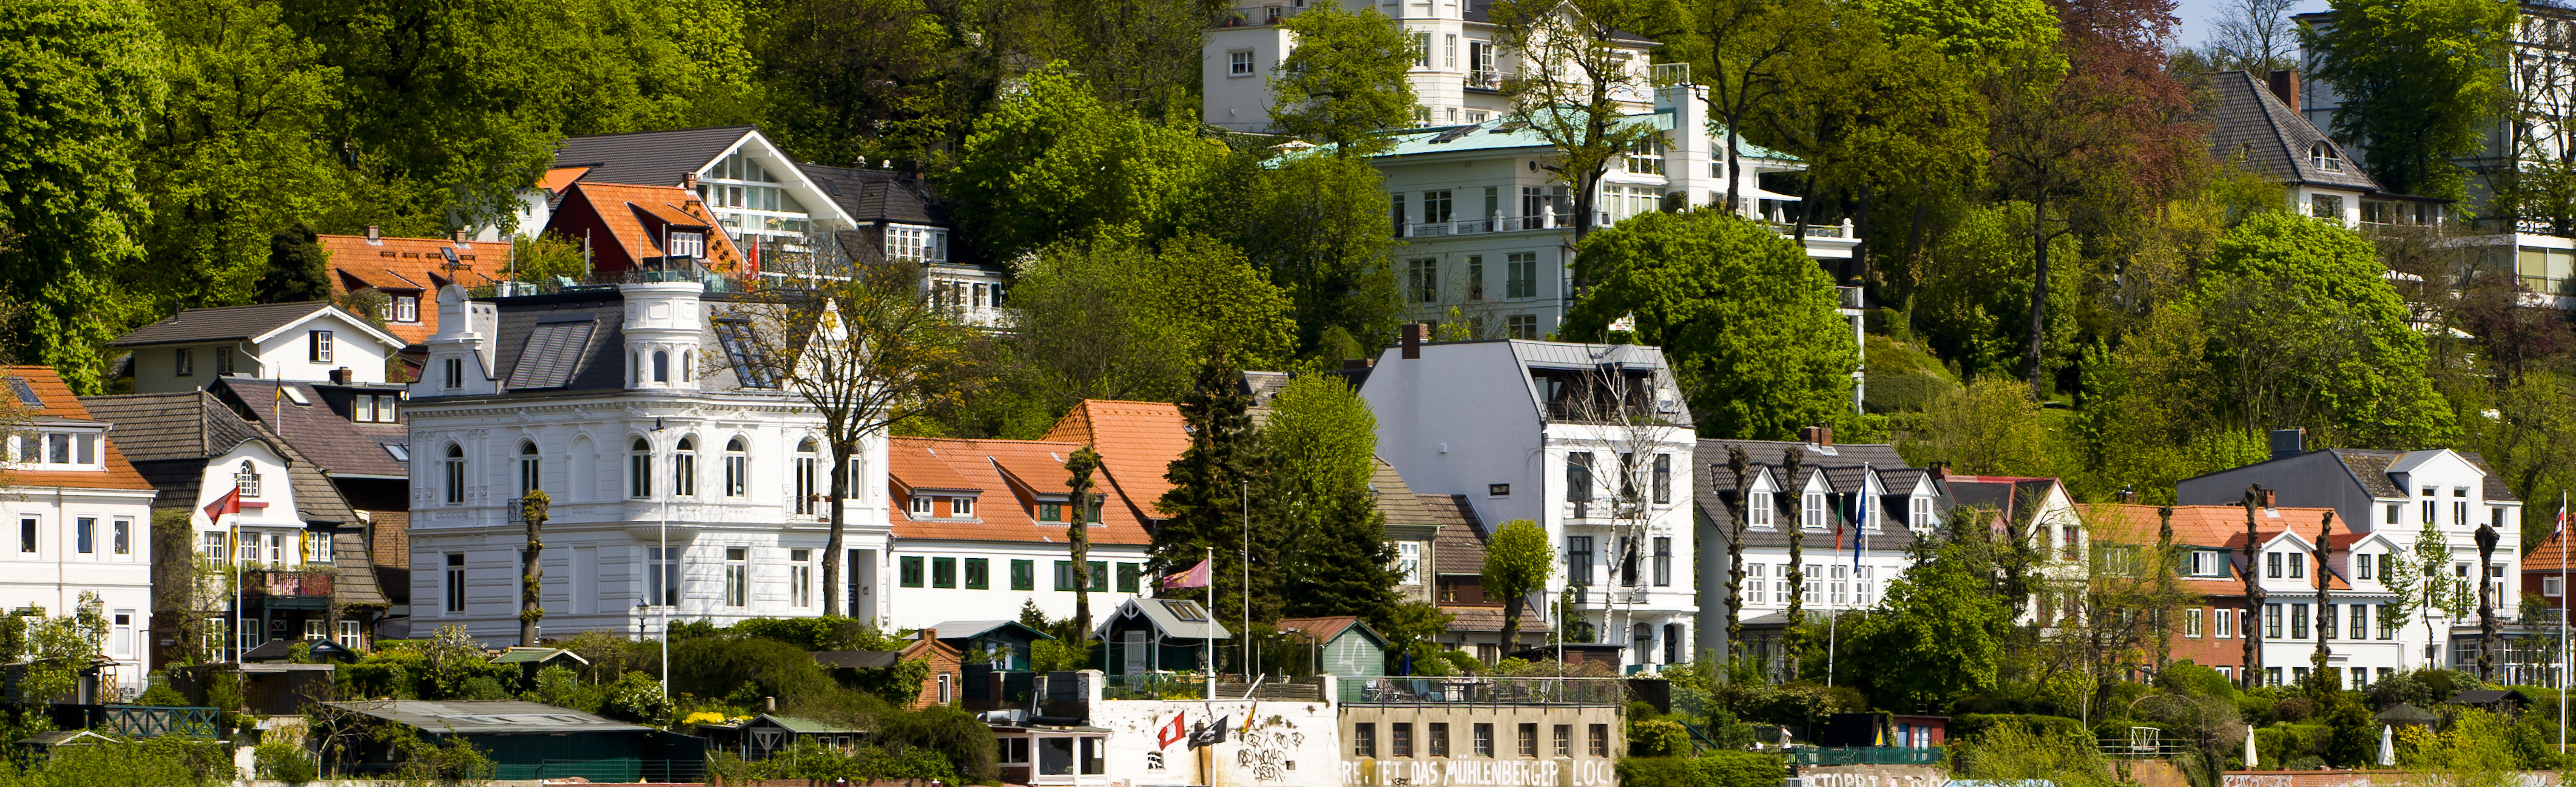 Immobilien in Hamburg Blankenese Rissen Nienstedten